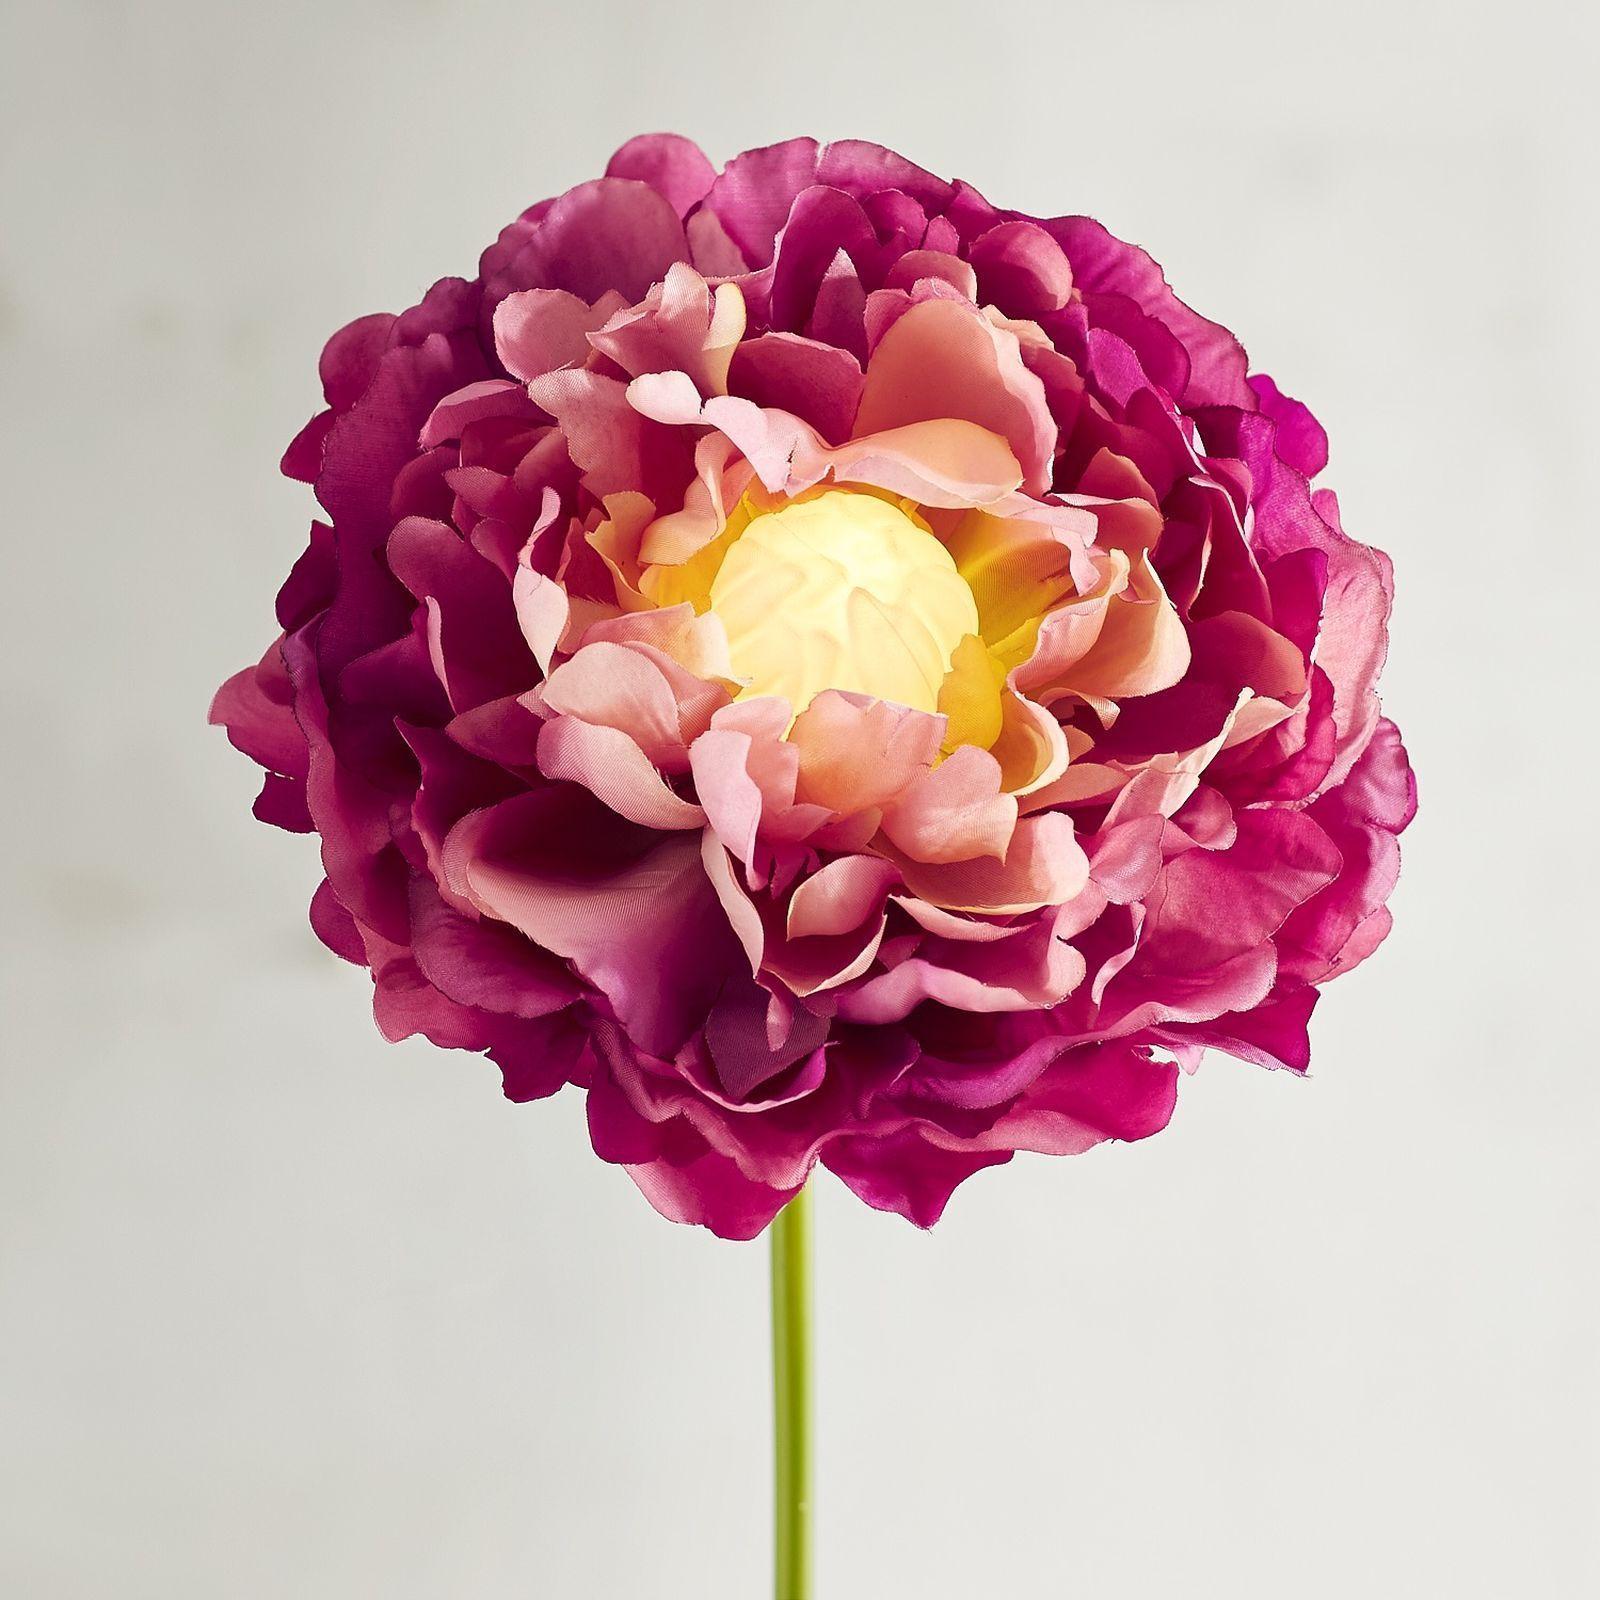 Led Light Up Long Stem Flower Collection My Pinterest Likes